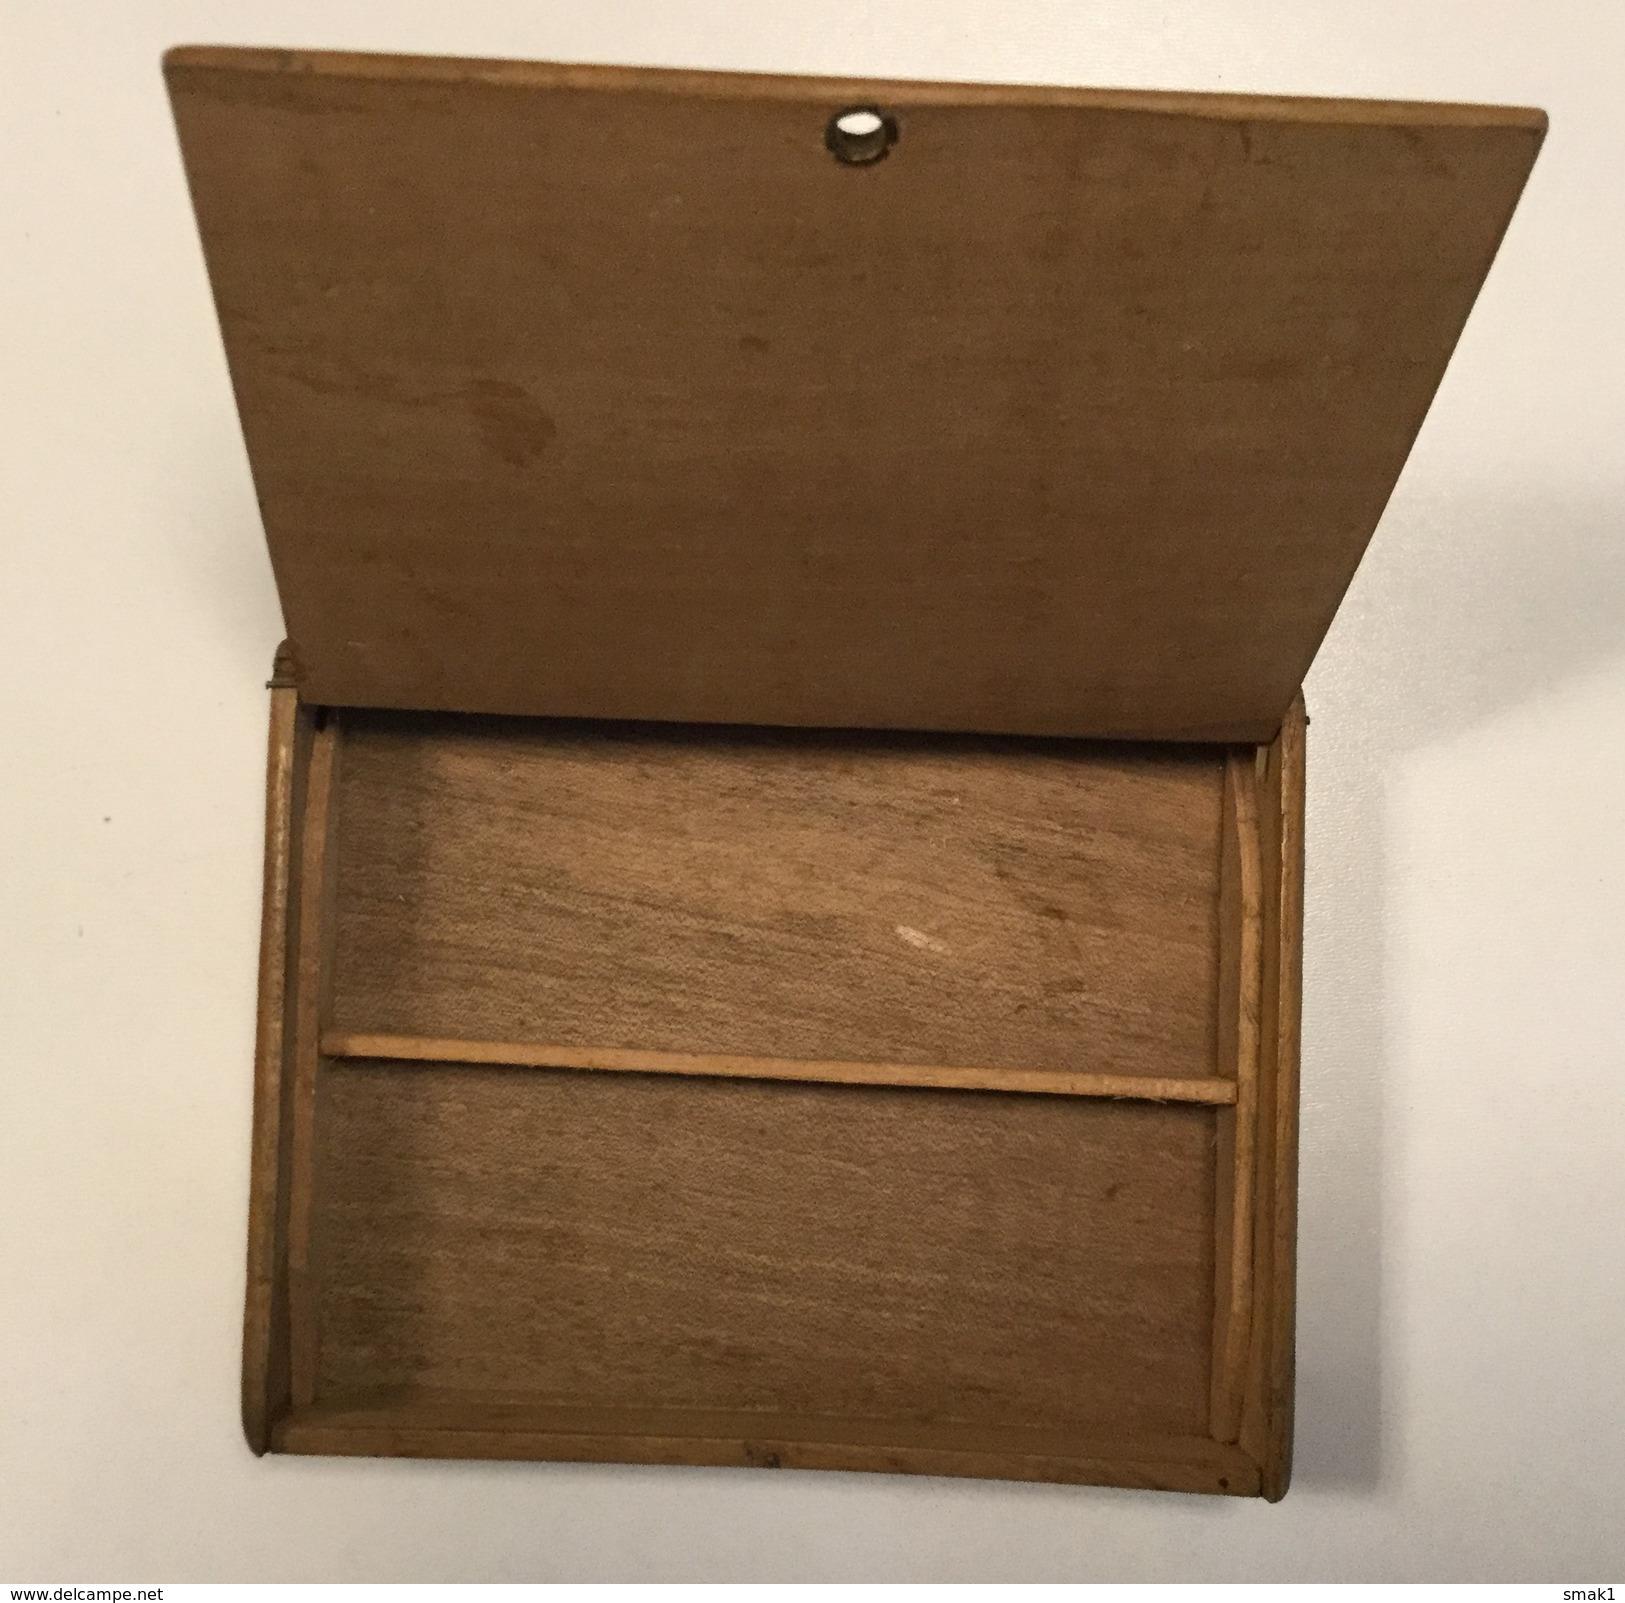 EMPTY CIGARE  BOX    MADE OF  WOOD   PERLA DE KUBA     DRZAVNI MONOPOL   YUGOSLAVIA - Cigar Cases